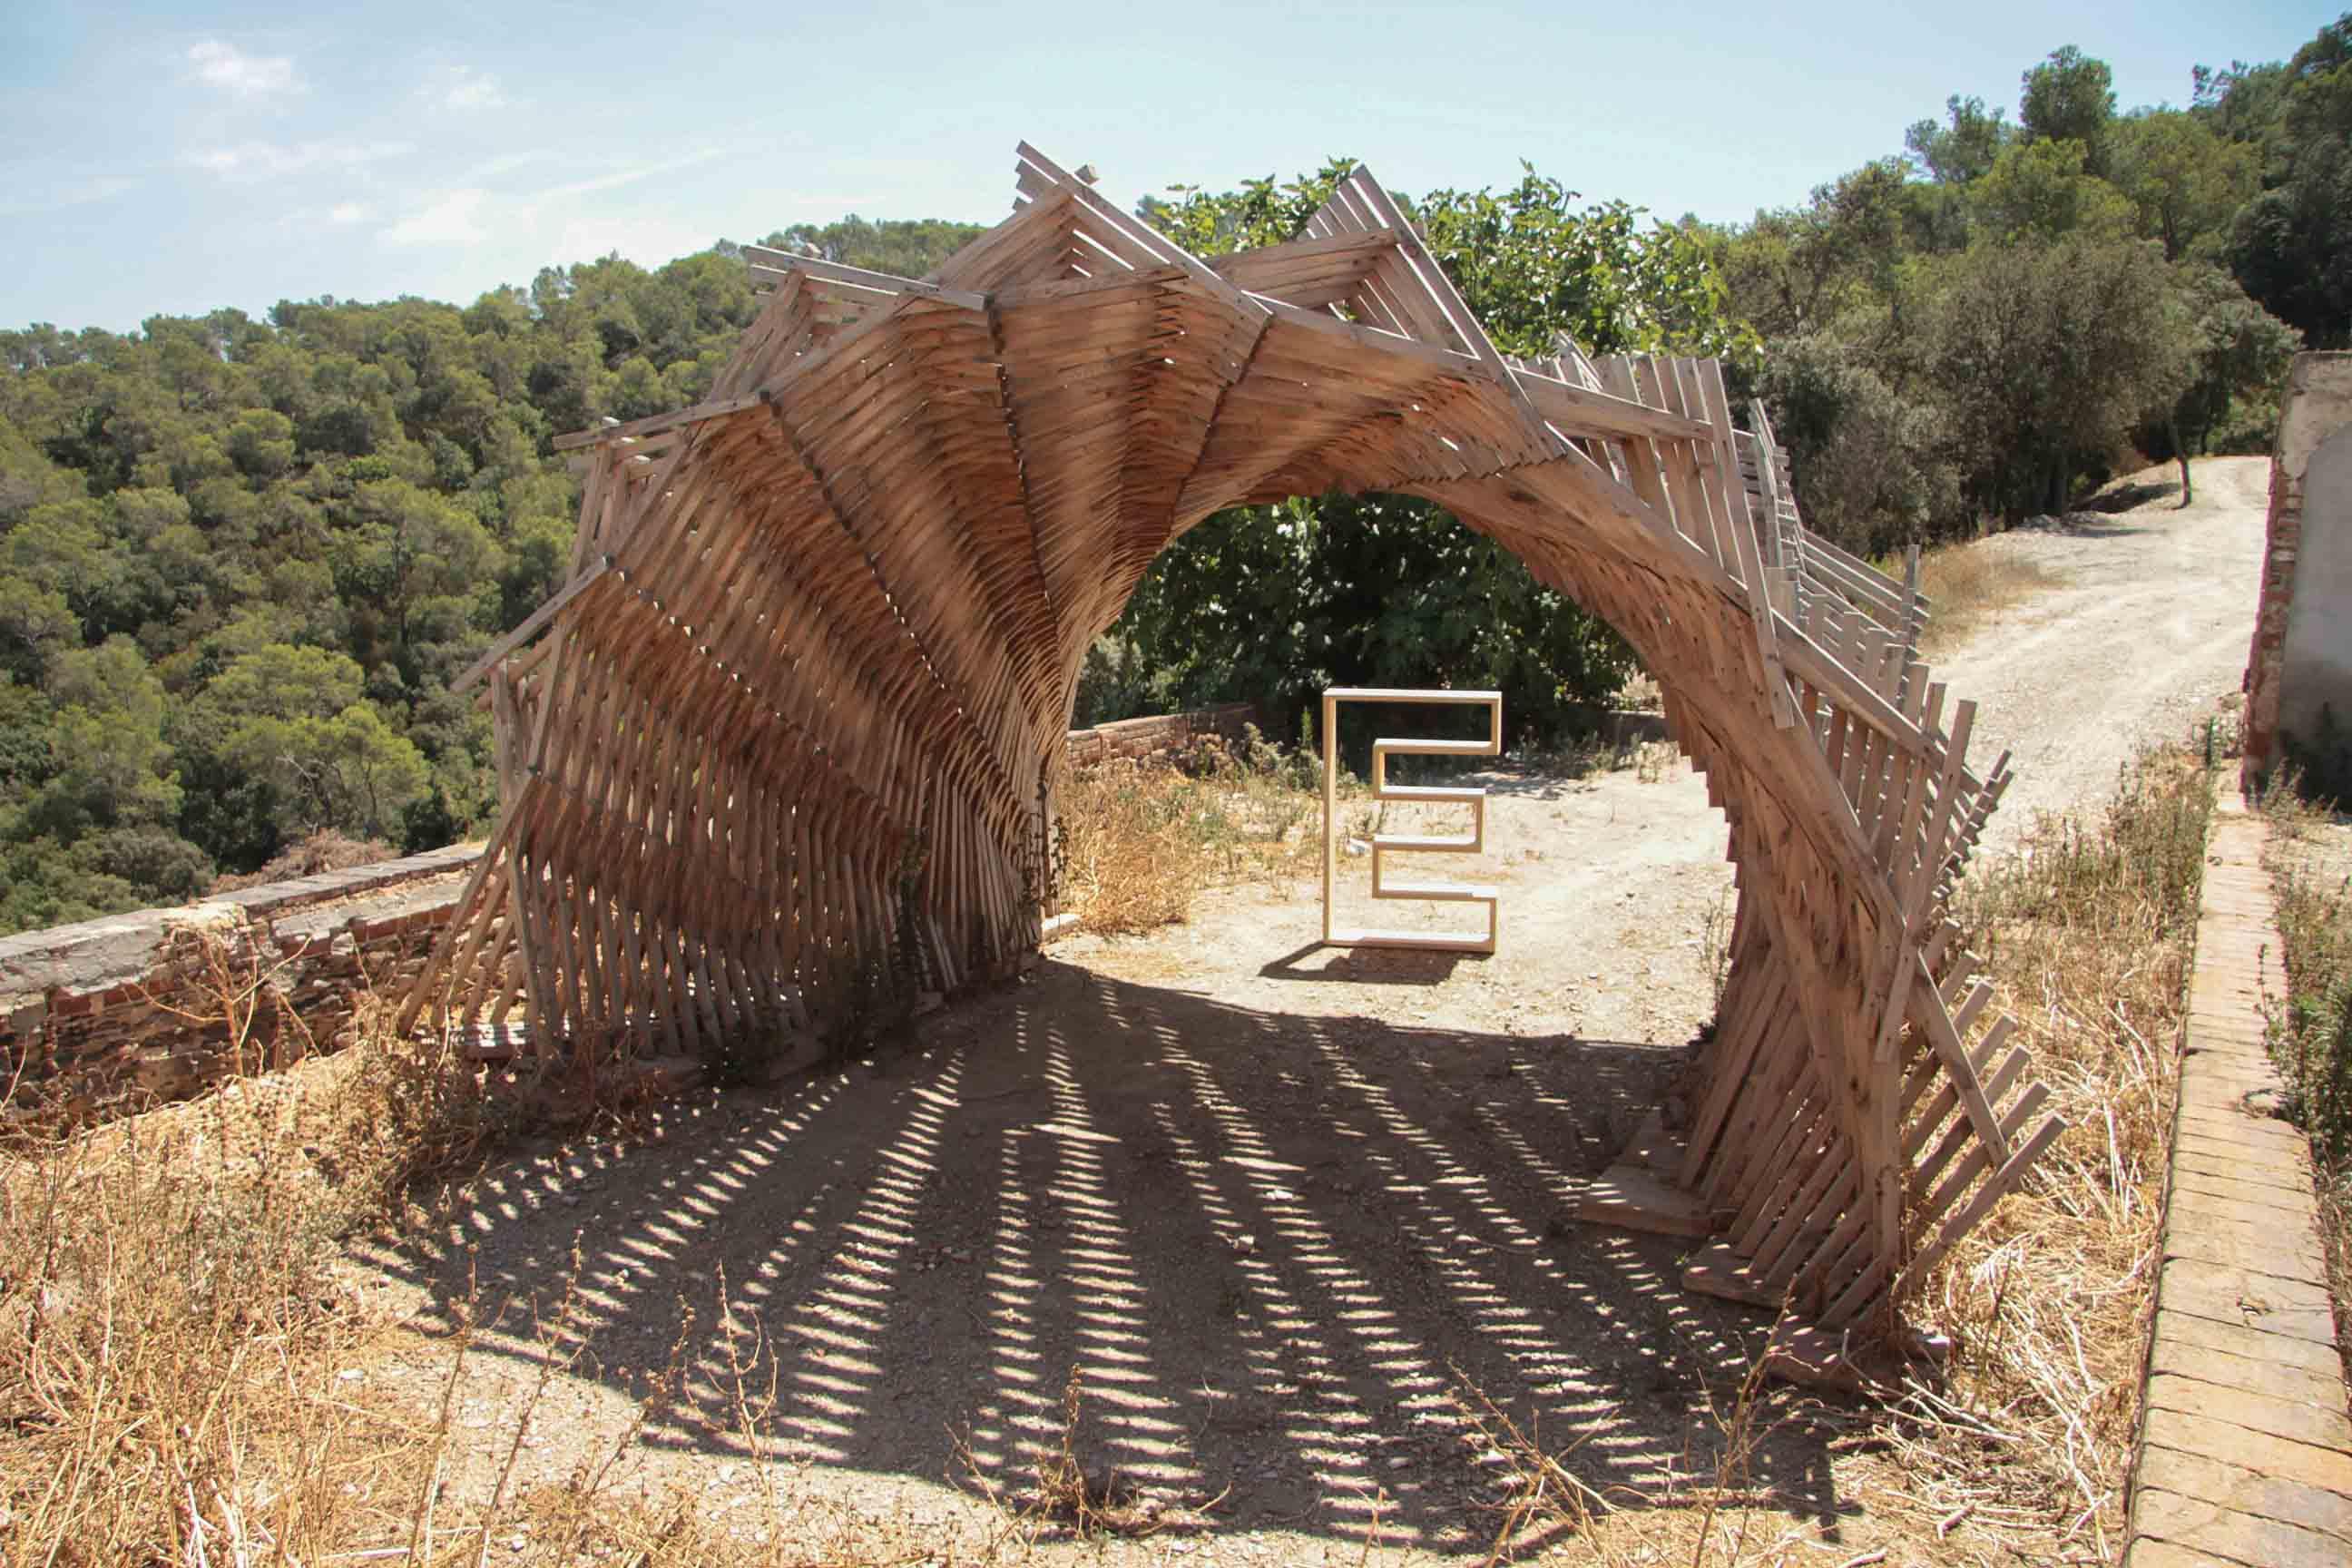 the valldaura experience-ms-balloon-iaac-lo-siento-design-hand-made-wood-work-barcelona_-33